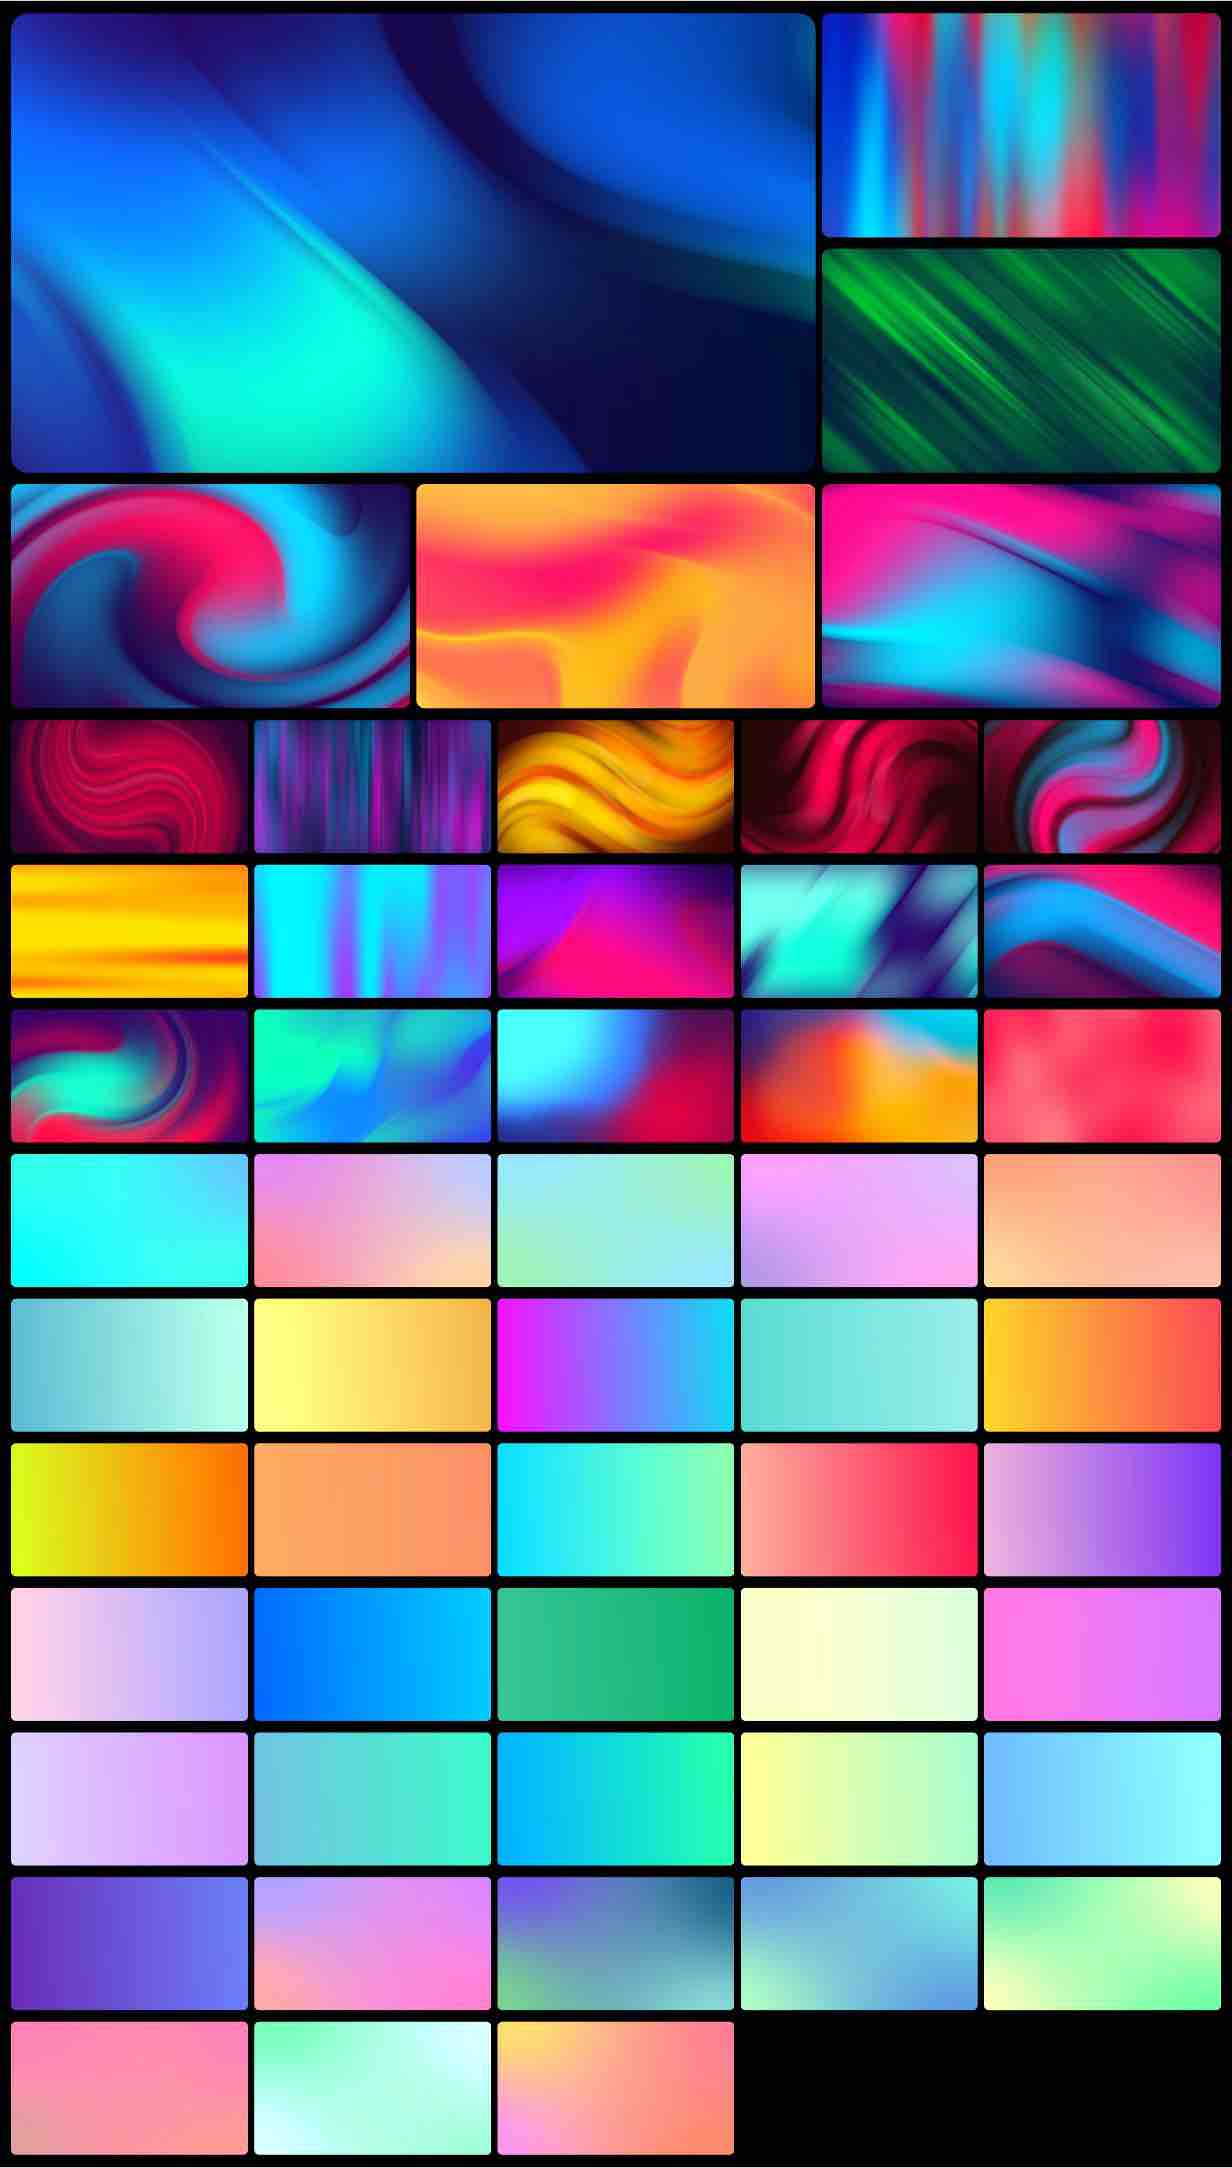 AE模板-2200+效果工具图形库 Graphics Pack插图20